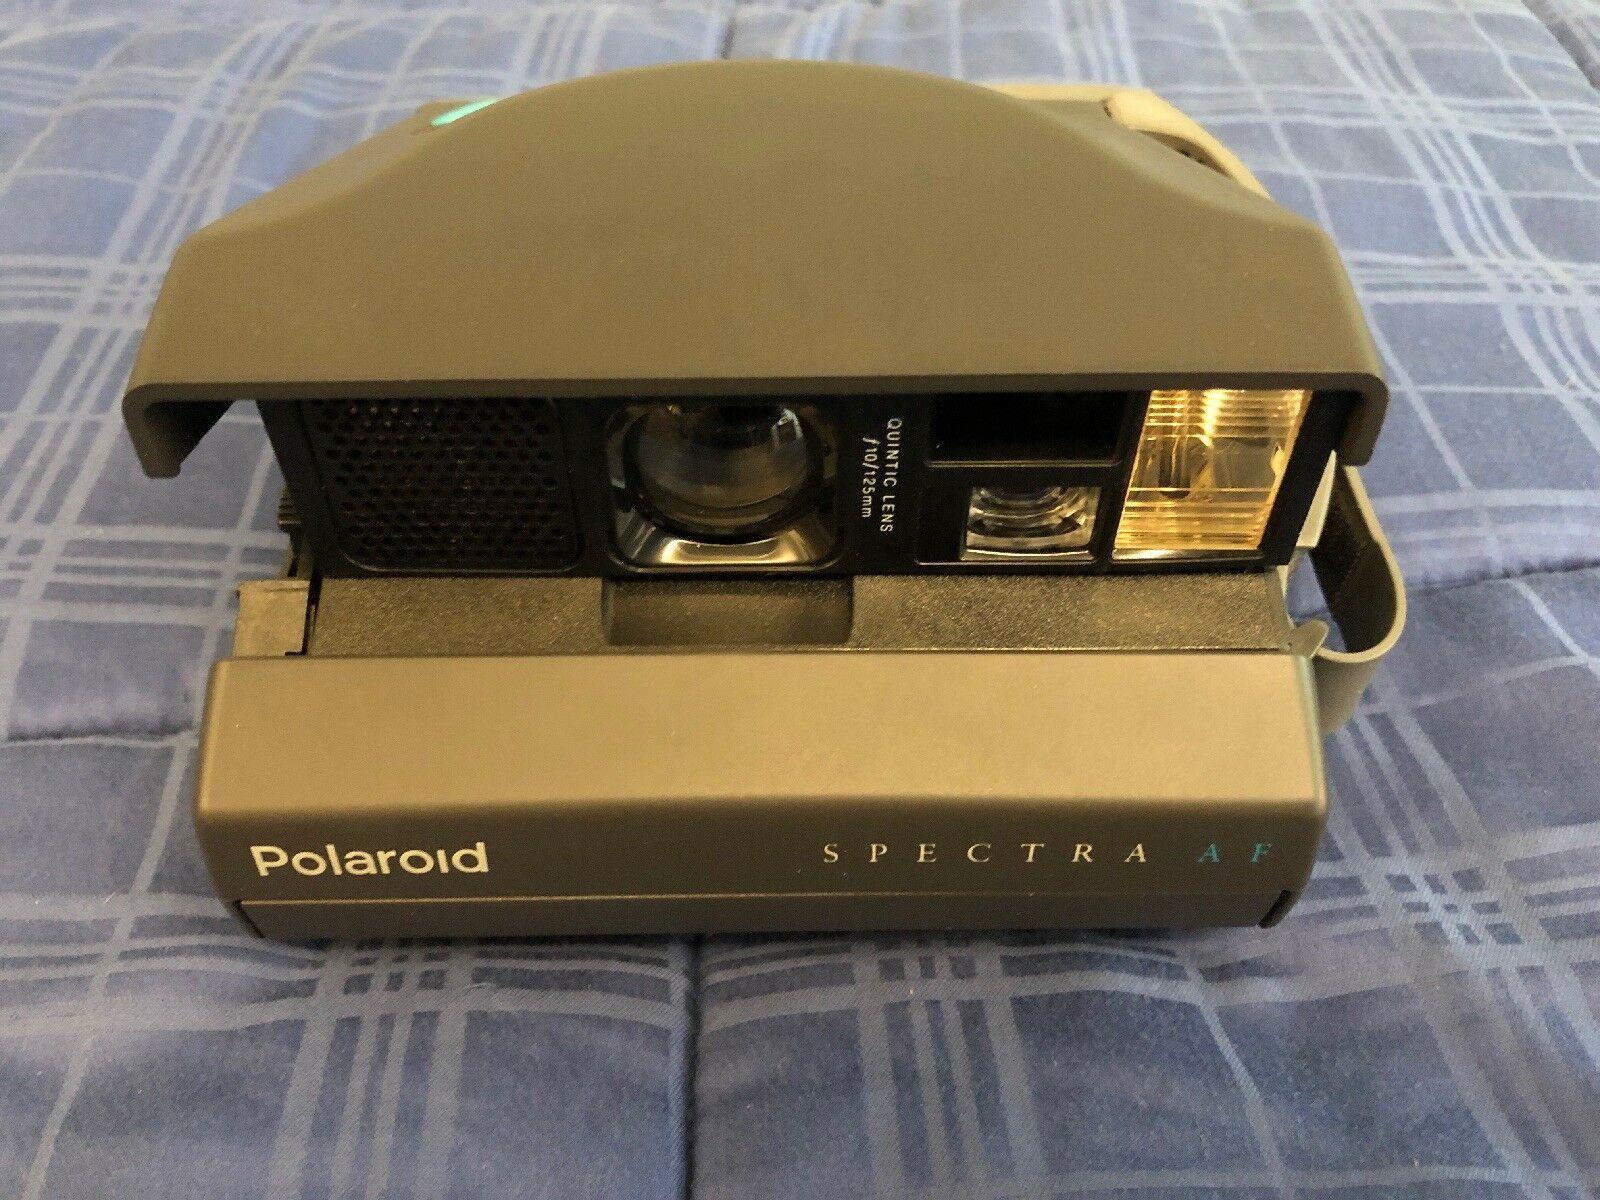 Polaroid Spectra AF Instant Film Camera - Original Box & Instructions